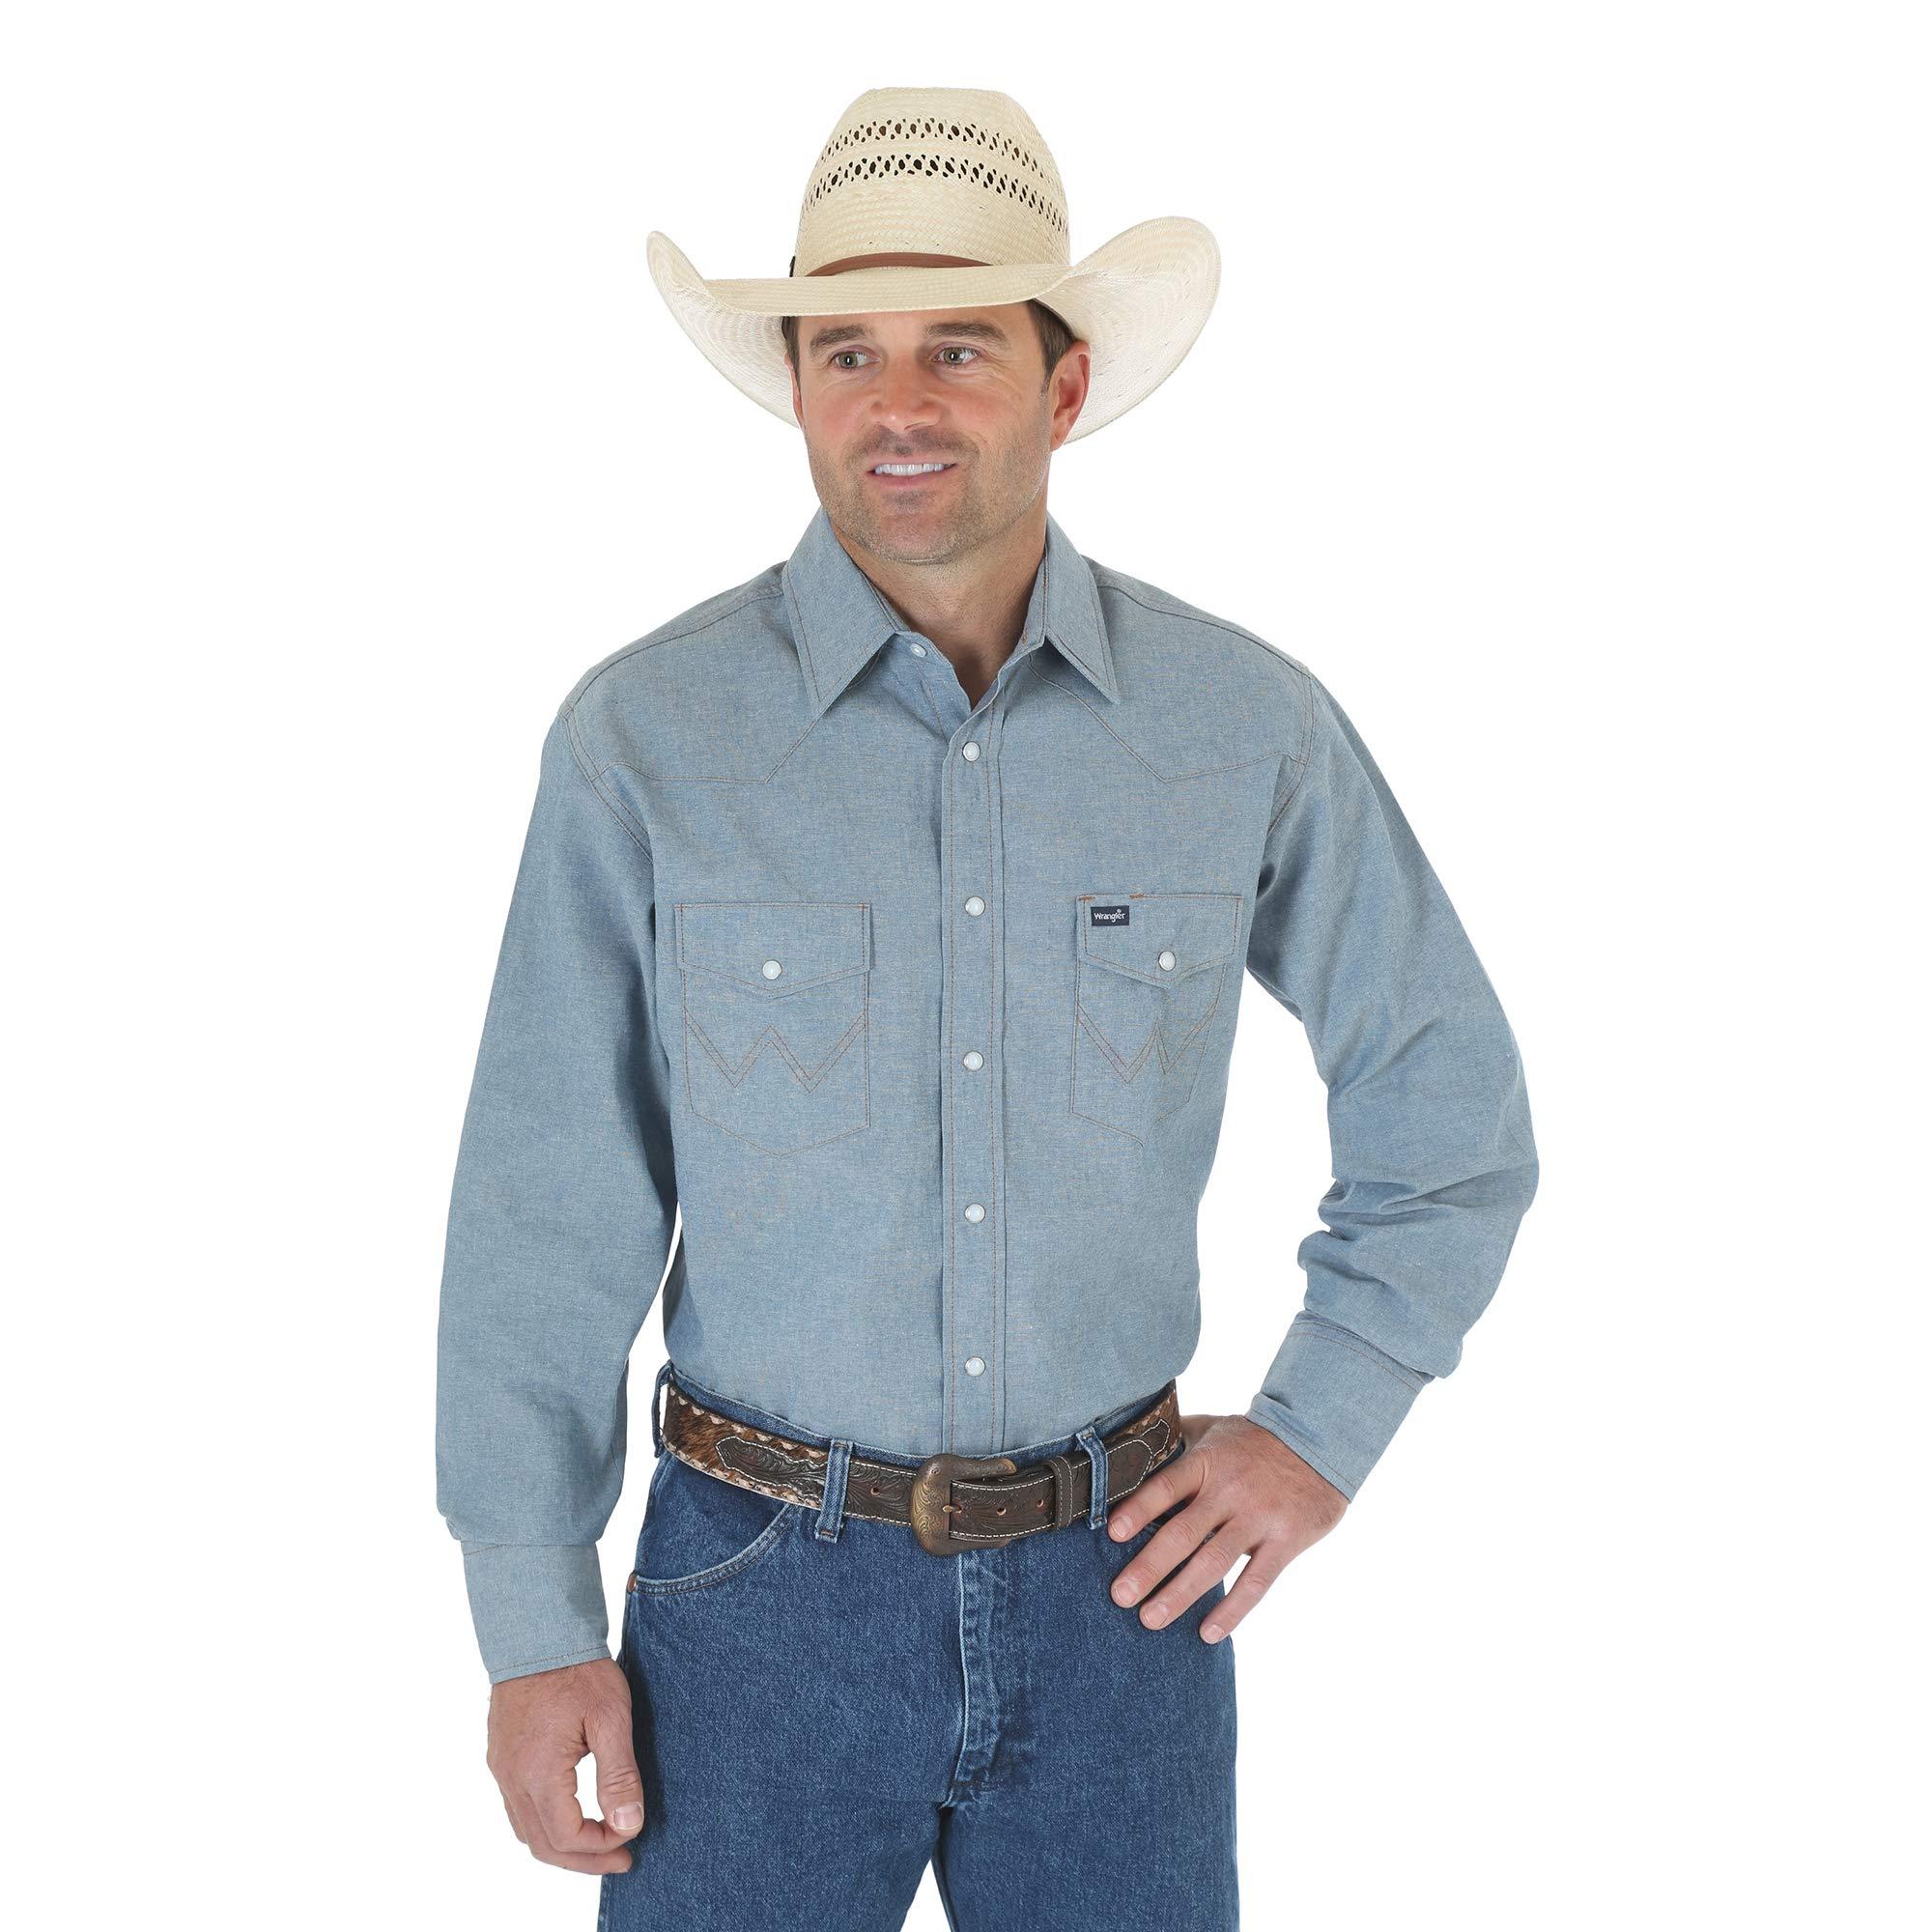 Wrangler Men's Big & Tall Western Work Shirt Firm Finish, Chambray Blue 3X Tall